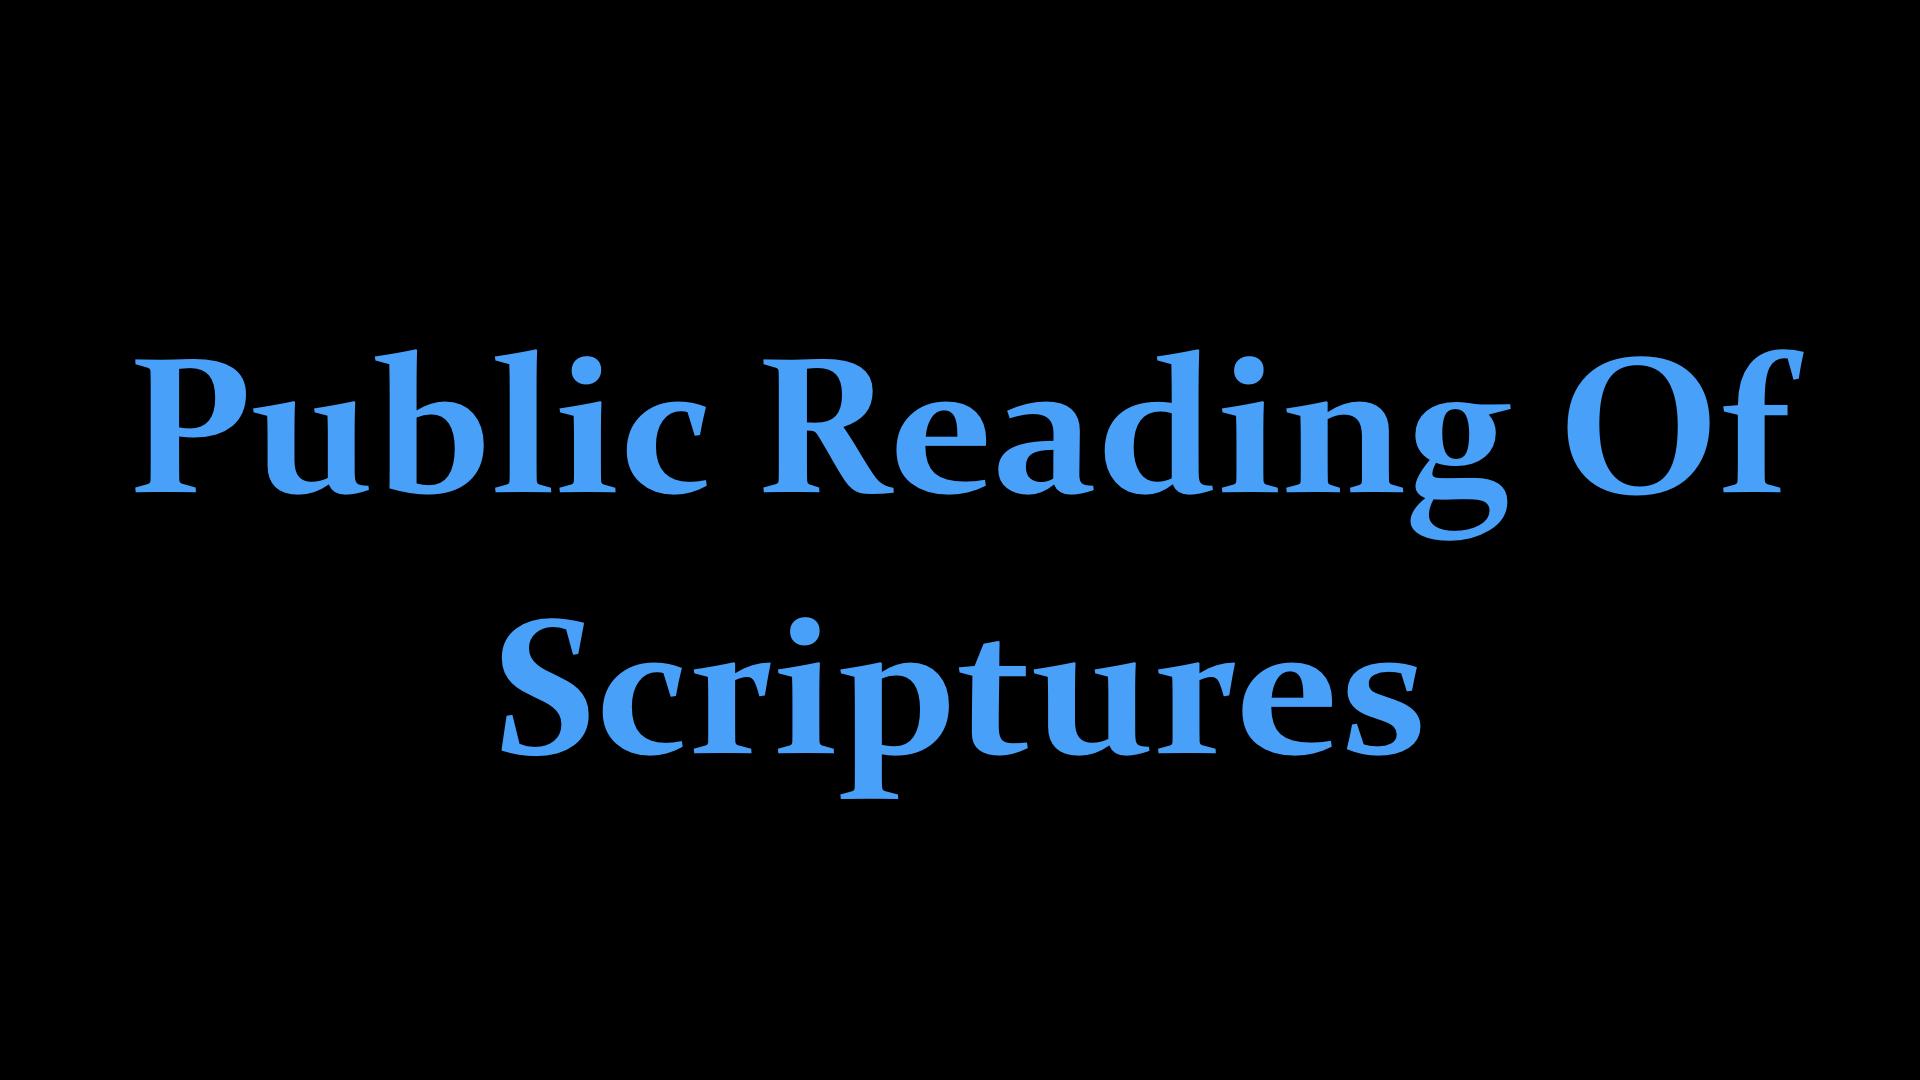 Public Reading Of Scriptures.001.jpeg